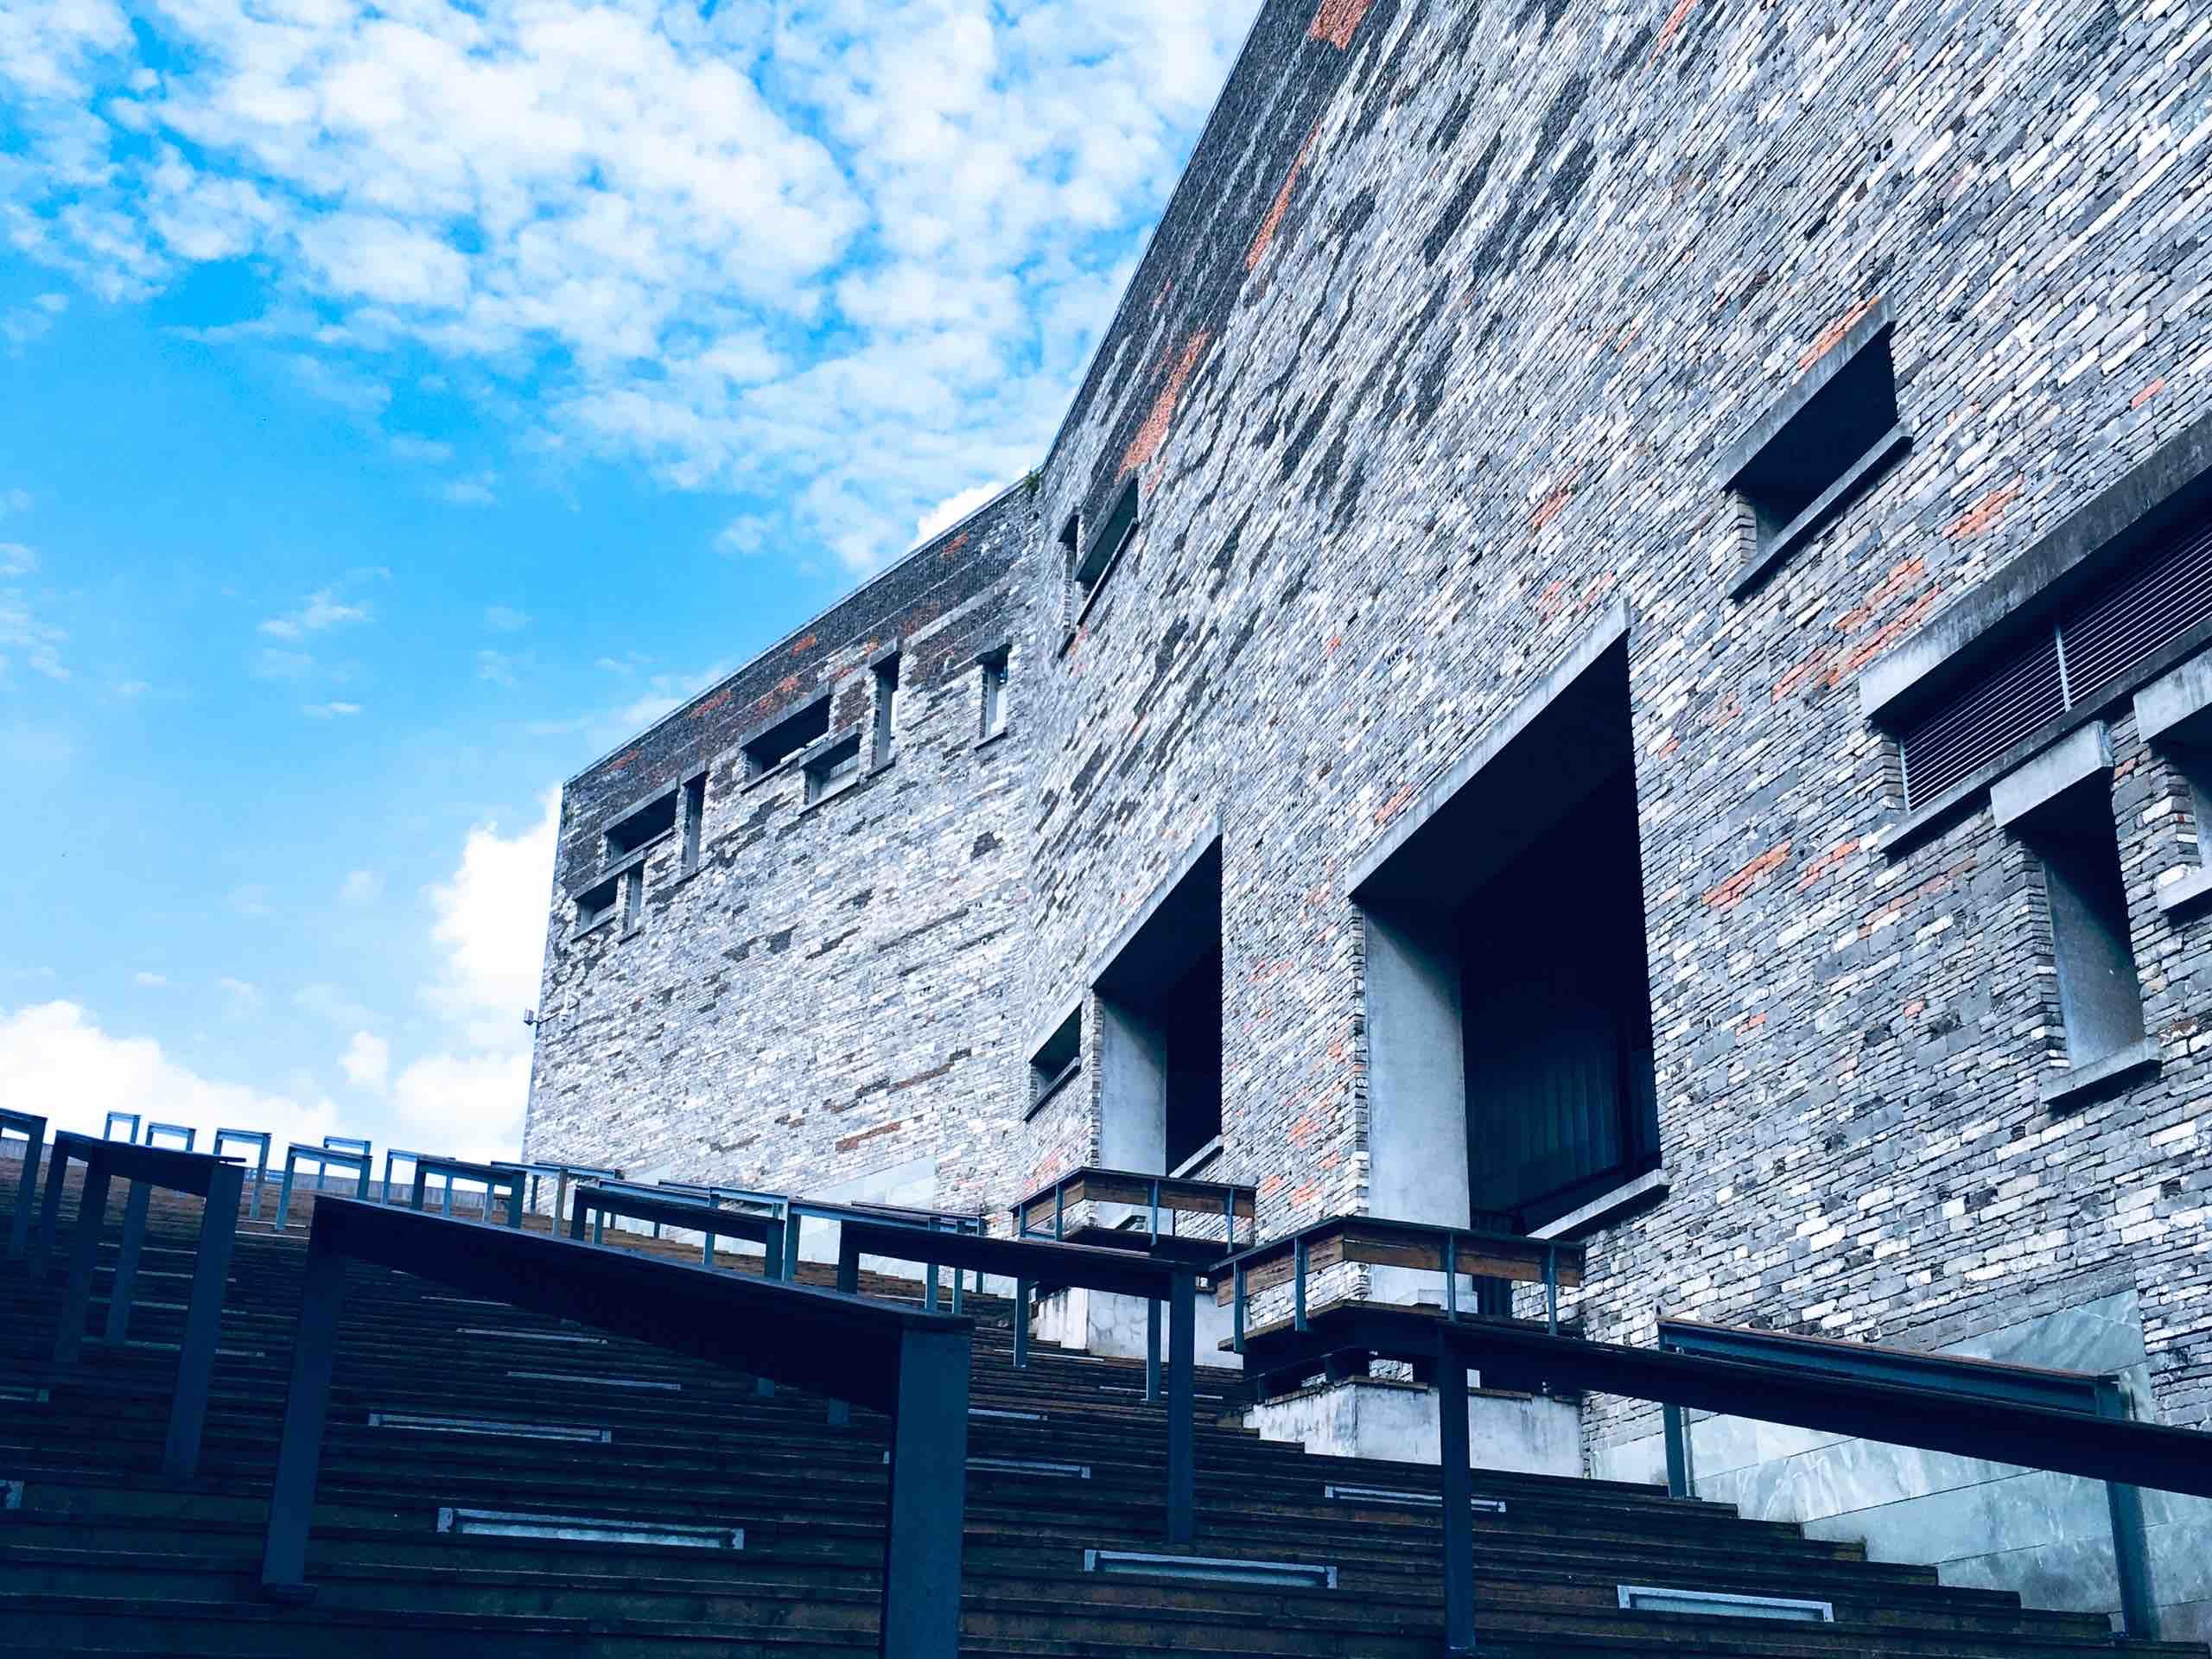 宁波博物馆